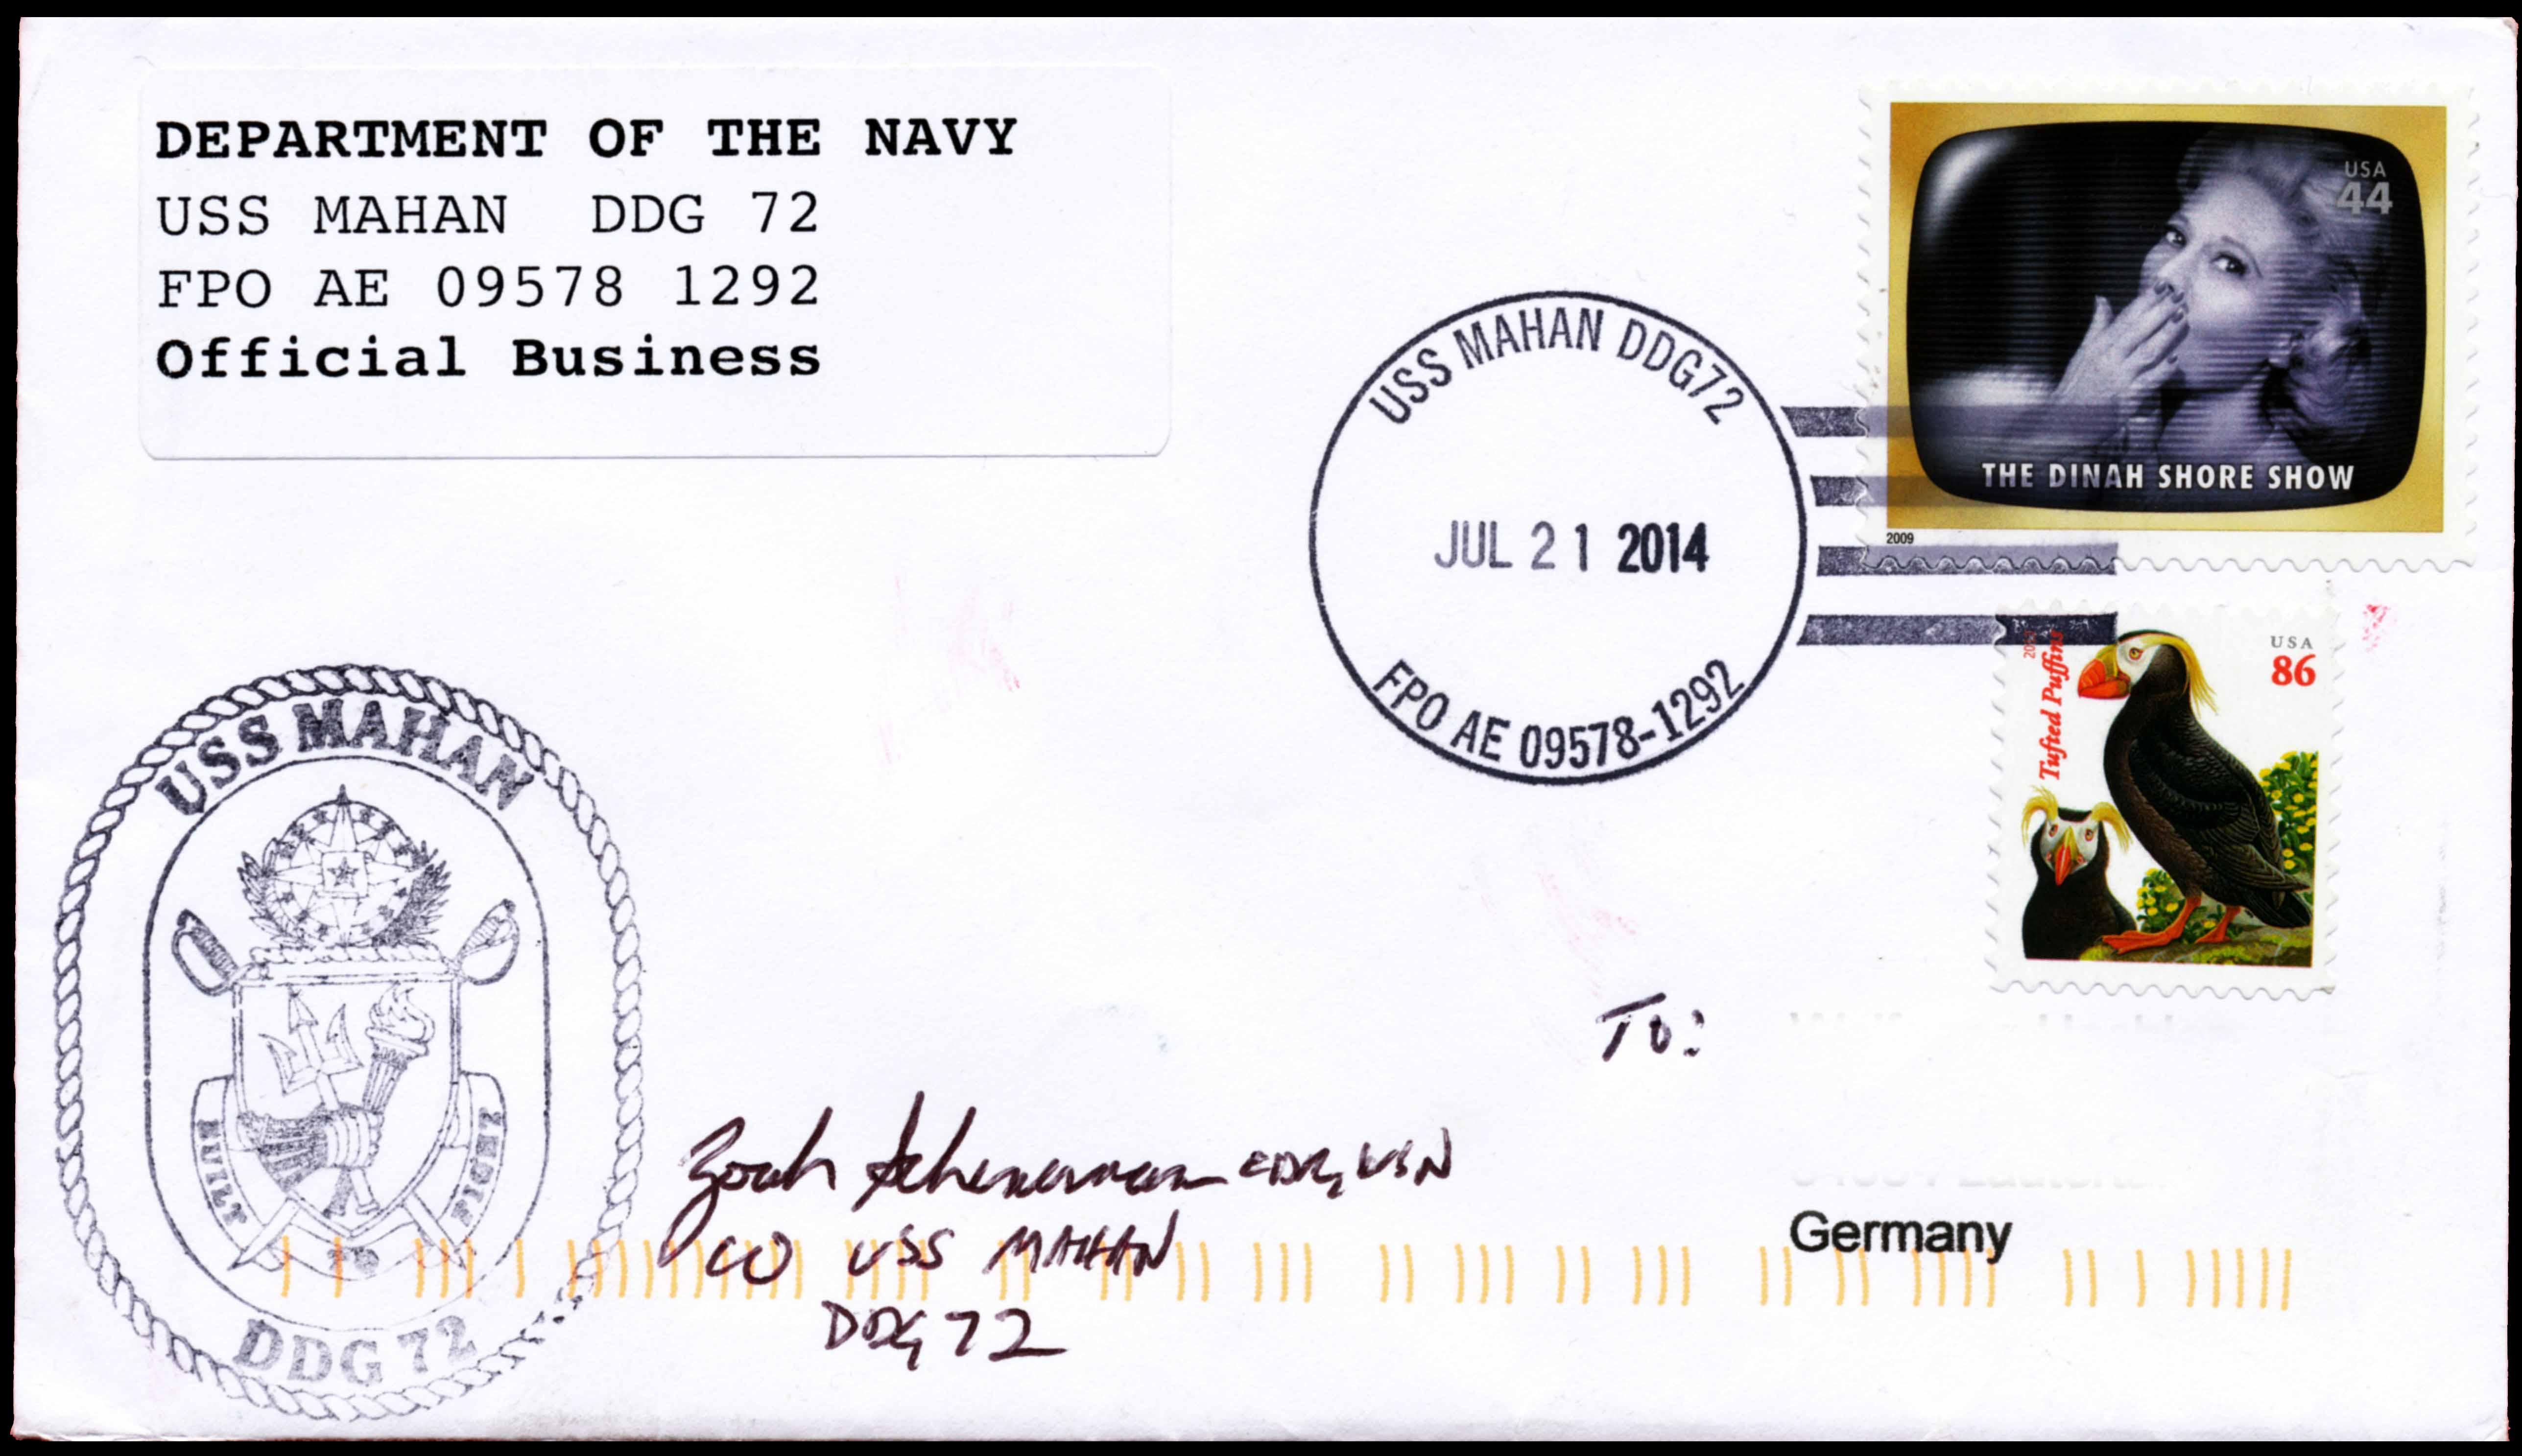 Beleg USS MAHAN DDG-72 vom 21.07.2014 von Wolfgang Hechler